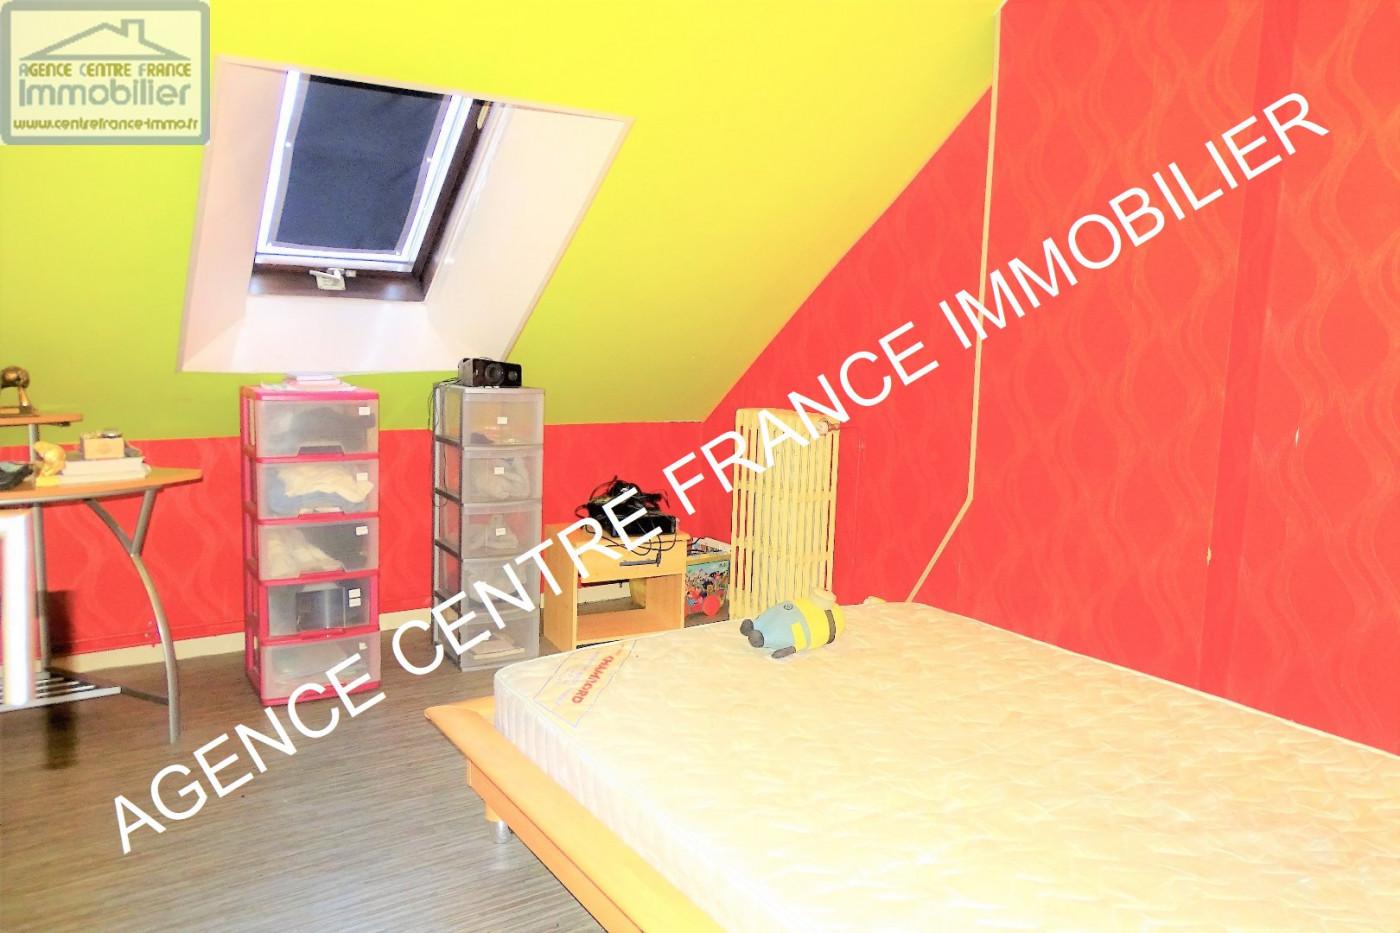 A vendre  Bourges | Réf 030011492 - Agence centre france immobilier